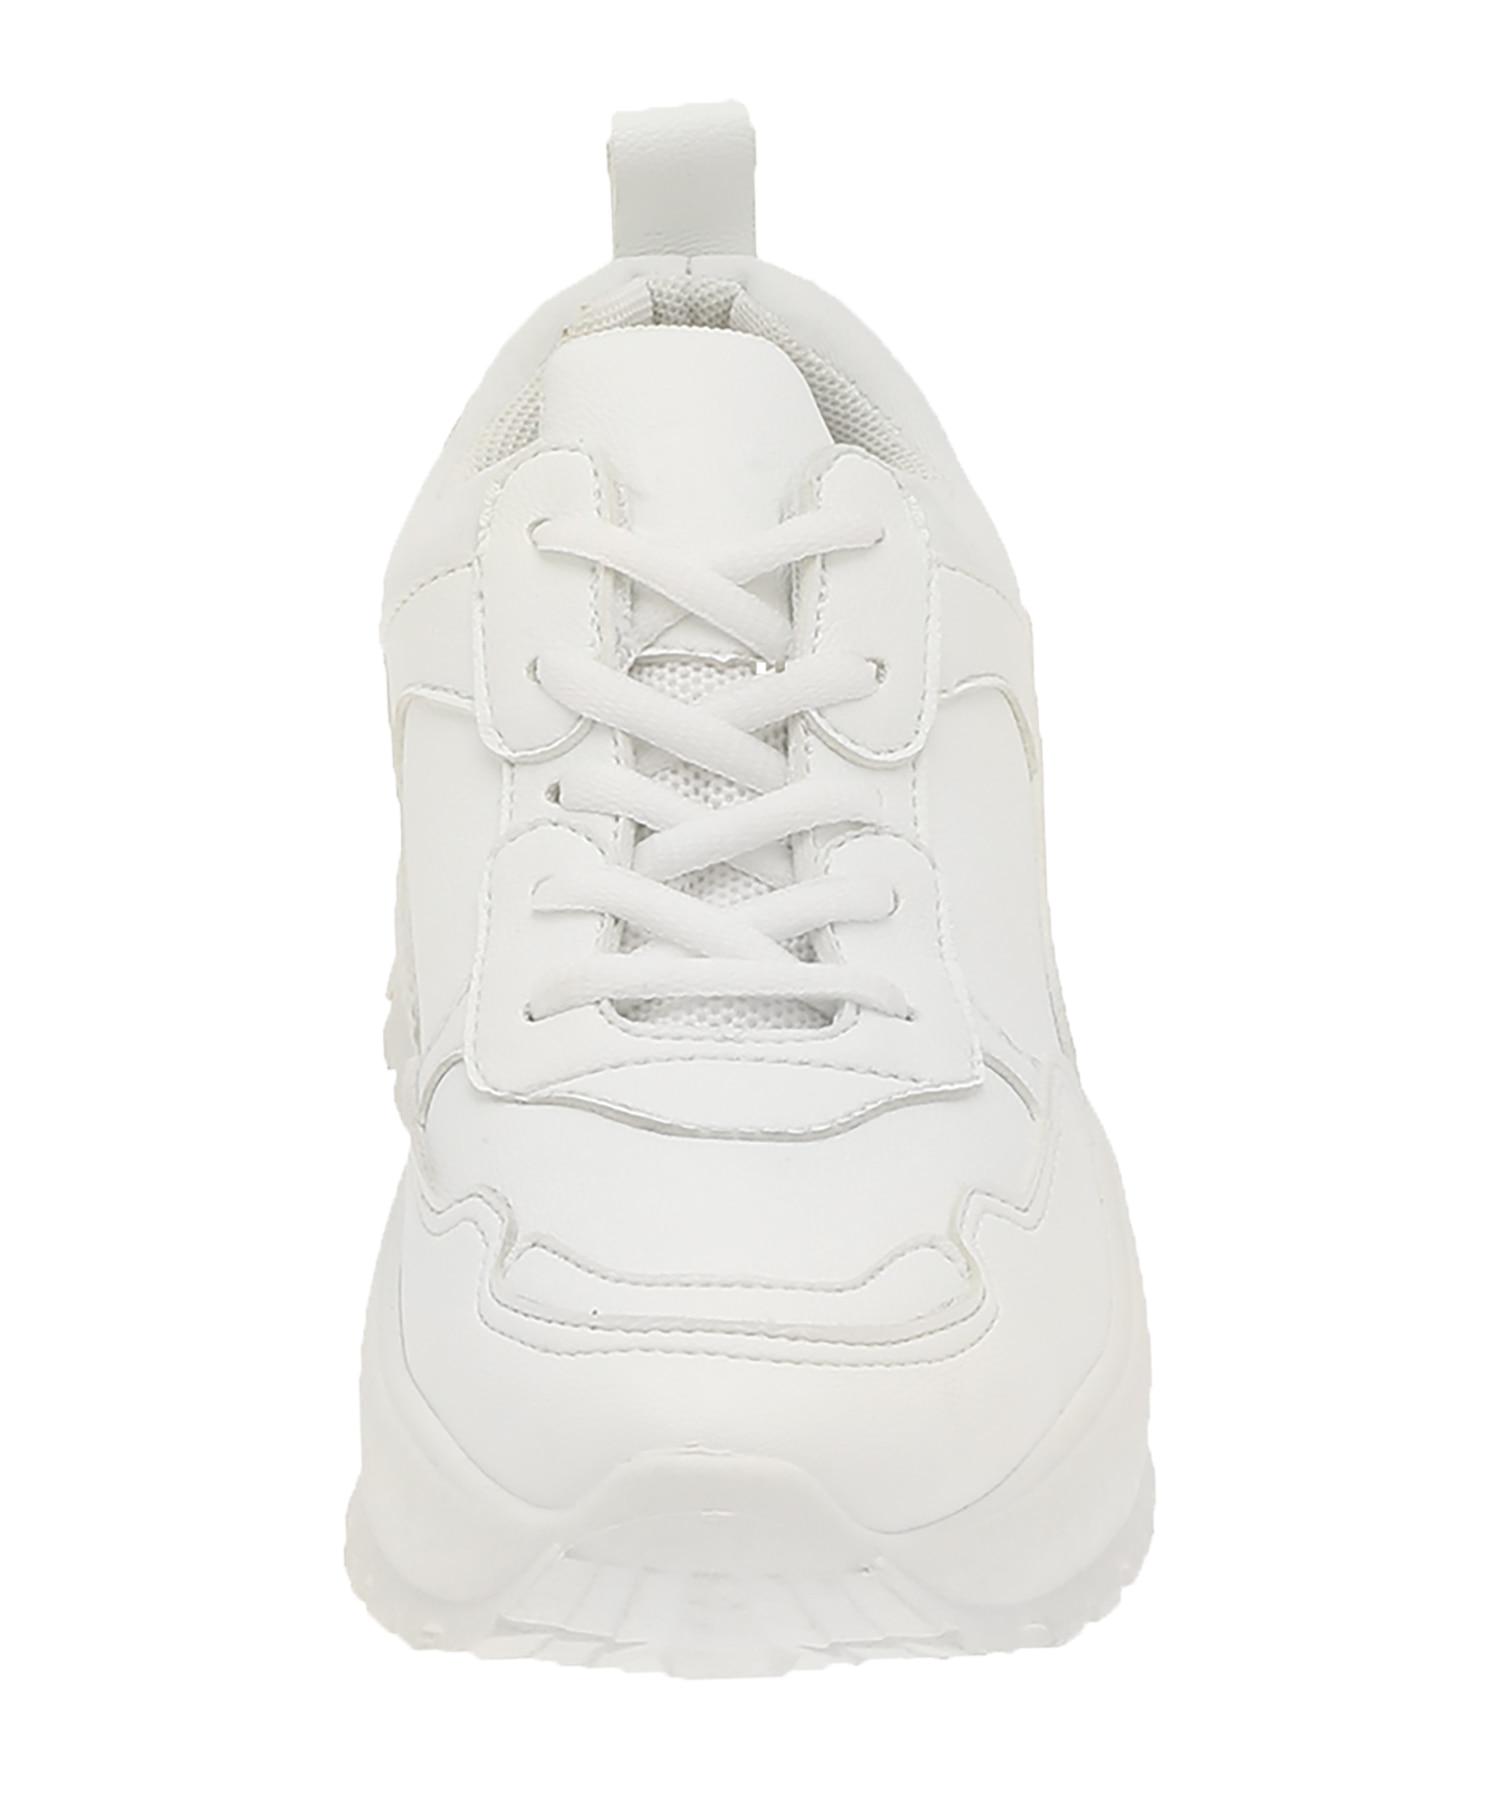 Noodles Deepwin Sneakers